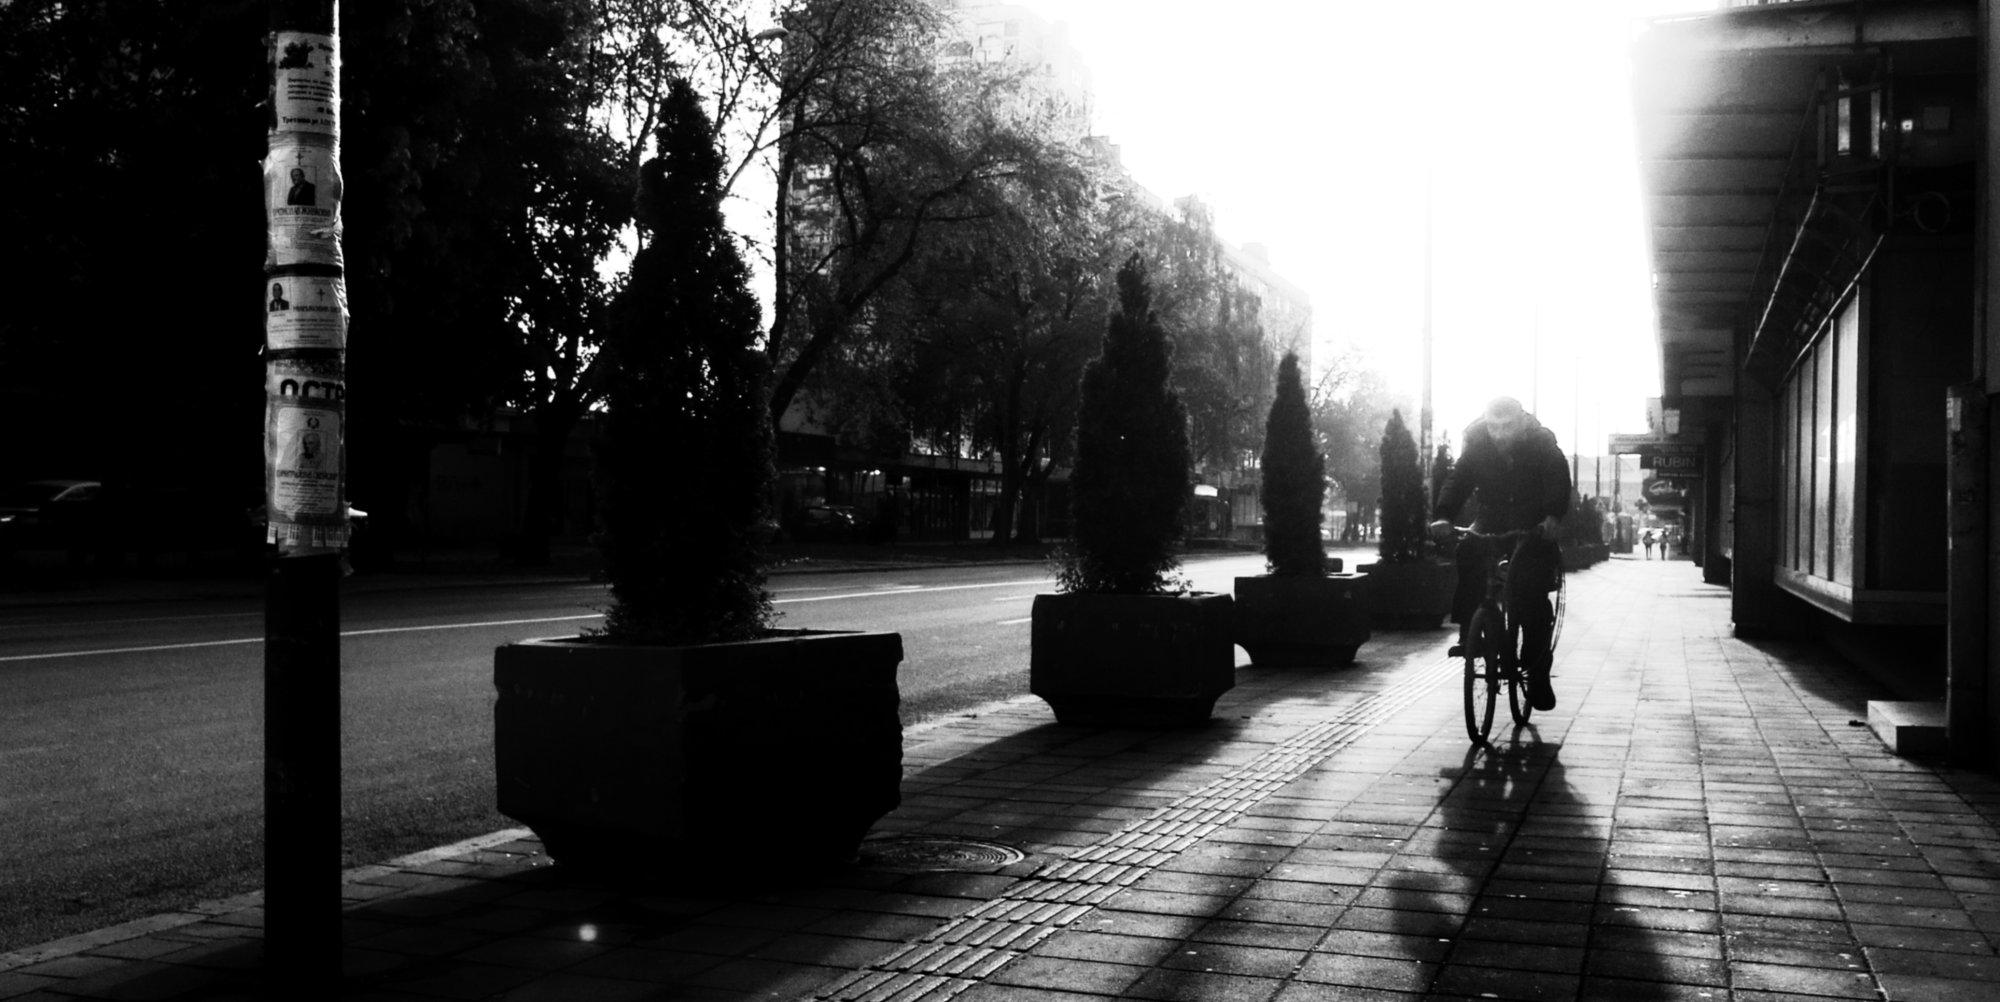 Shadows of Morning LXIV